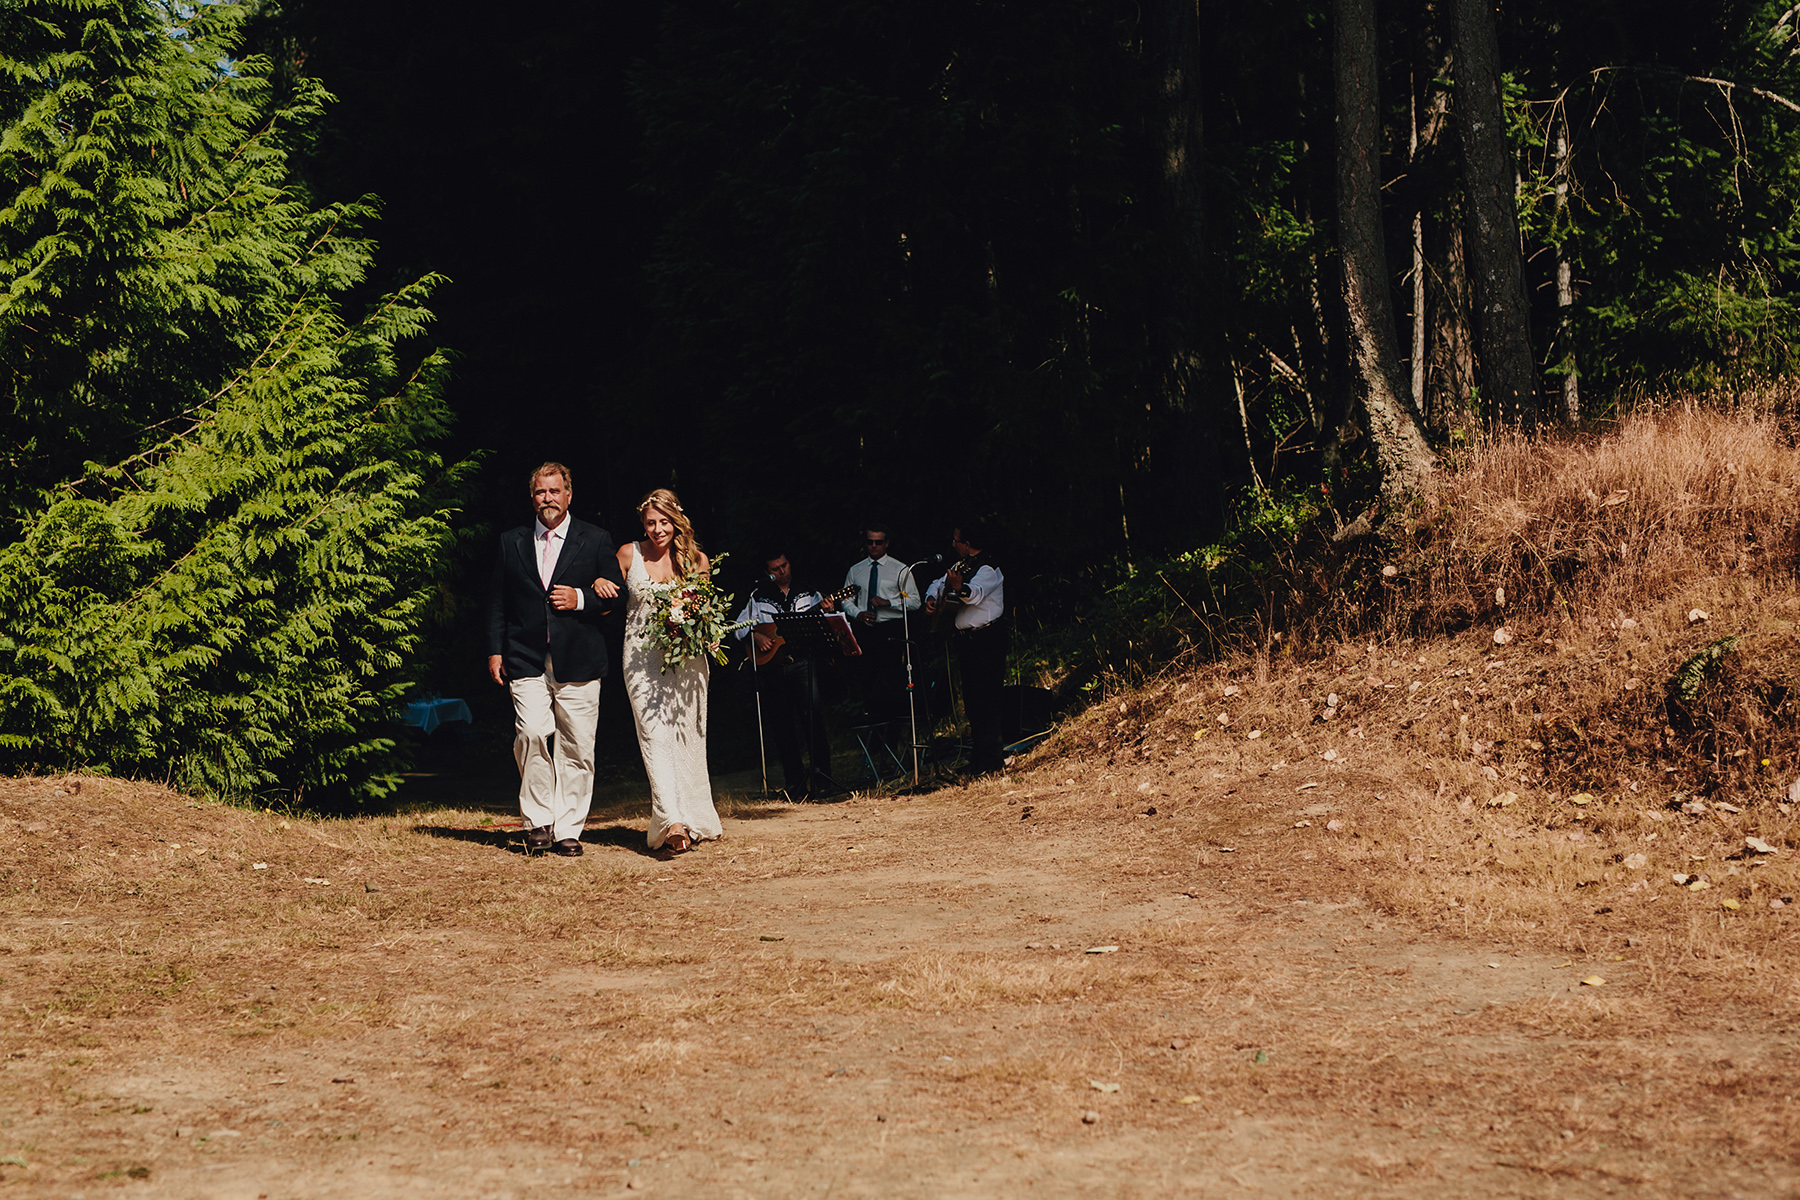 bodega-ridge-wedding-photos-0059.jpg